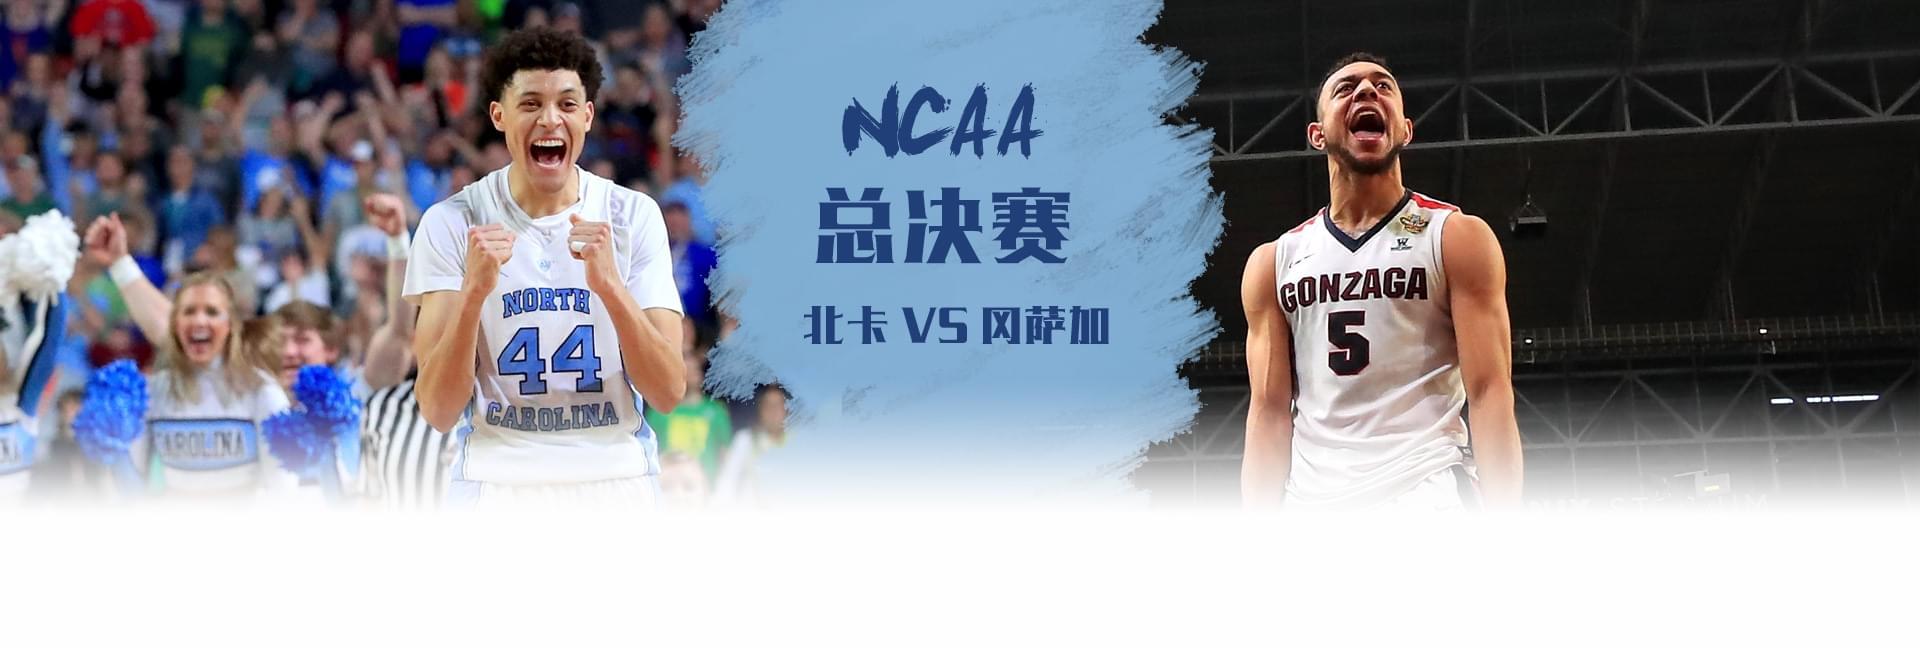 NCAA決賽前瞻:岡薩加沖首冠+38勝 北卡救贖上季?